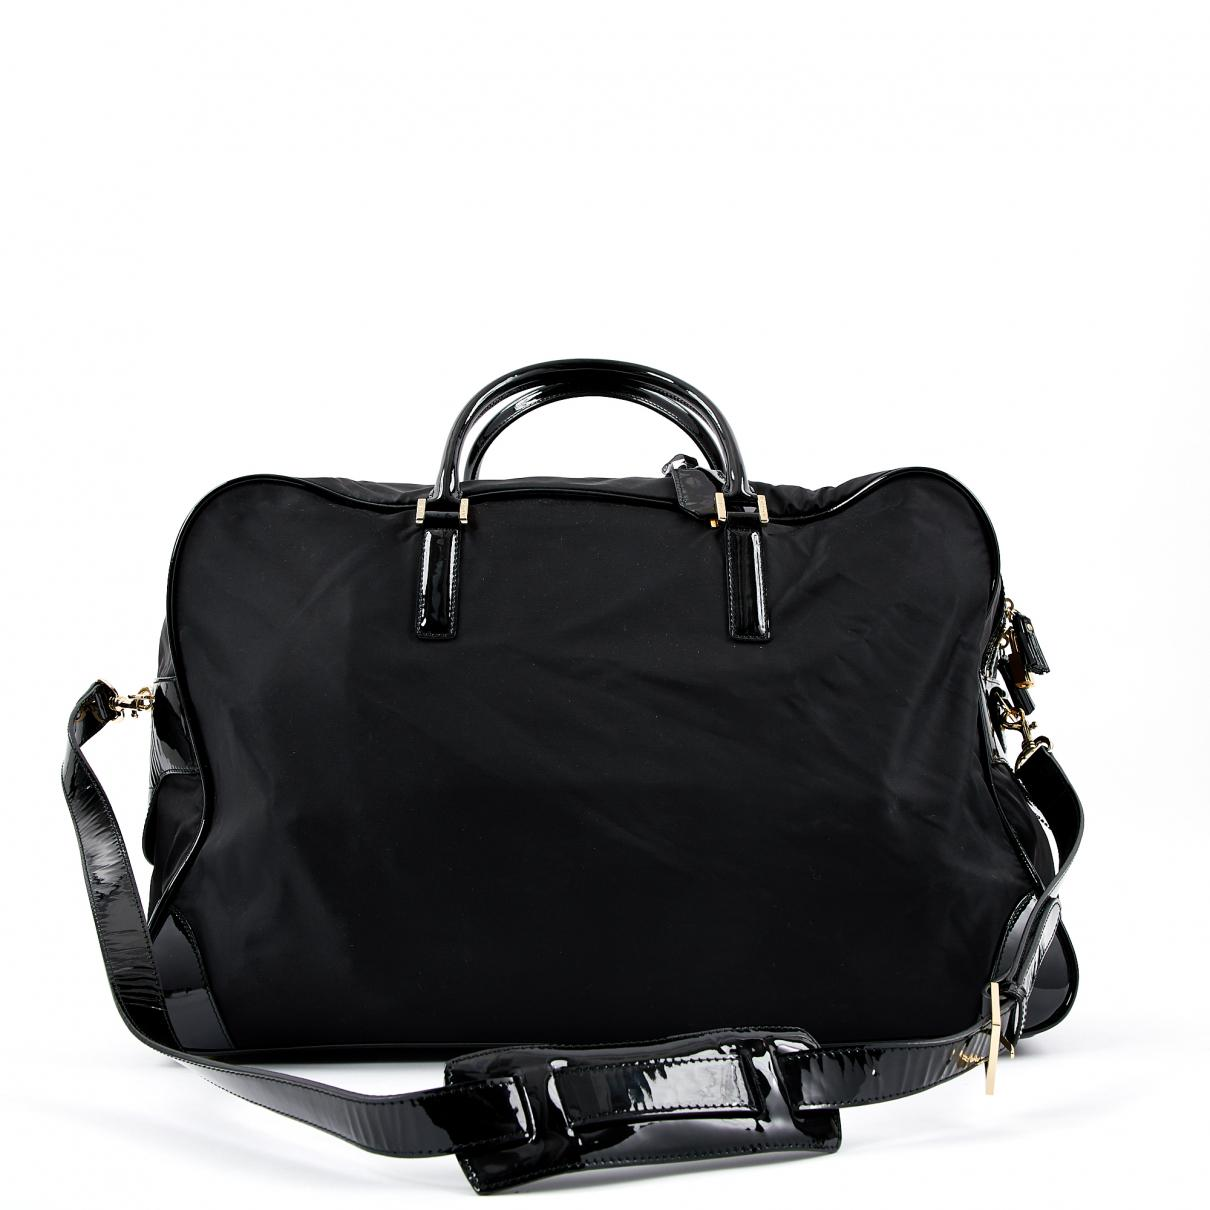 Anya Hindmarch Pre-owned - 48h bag GrwvX44Tju